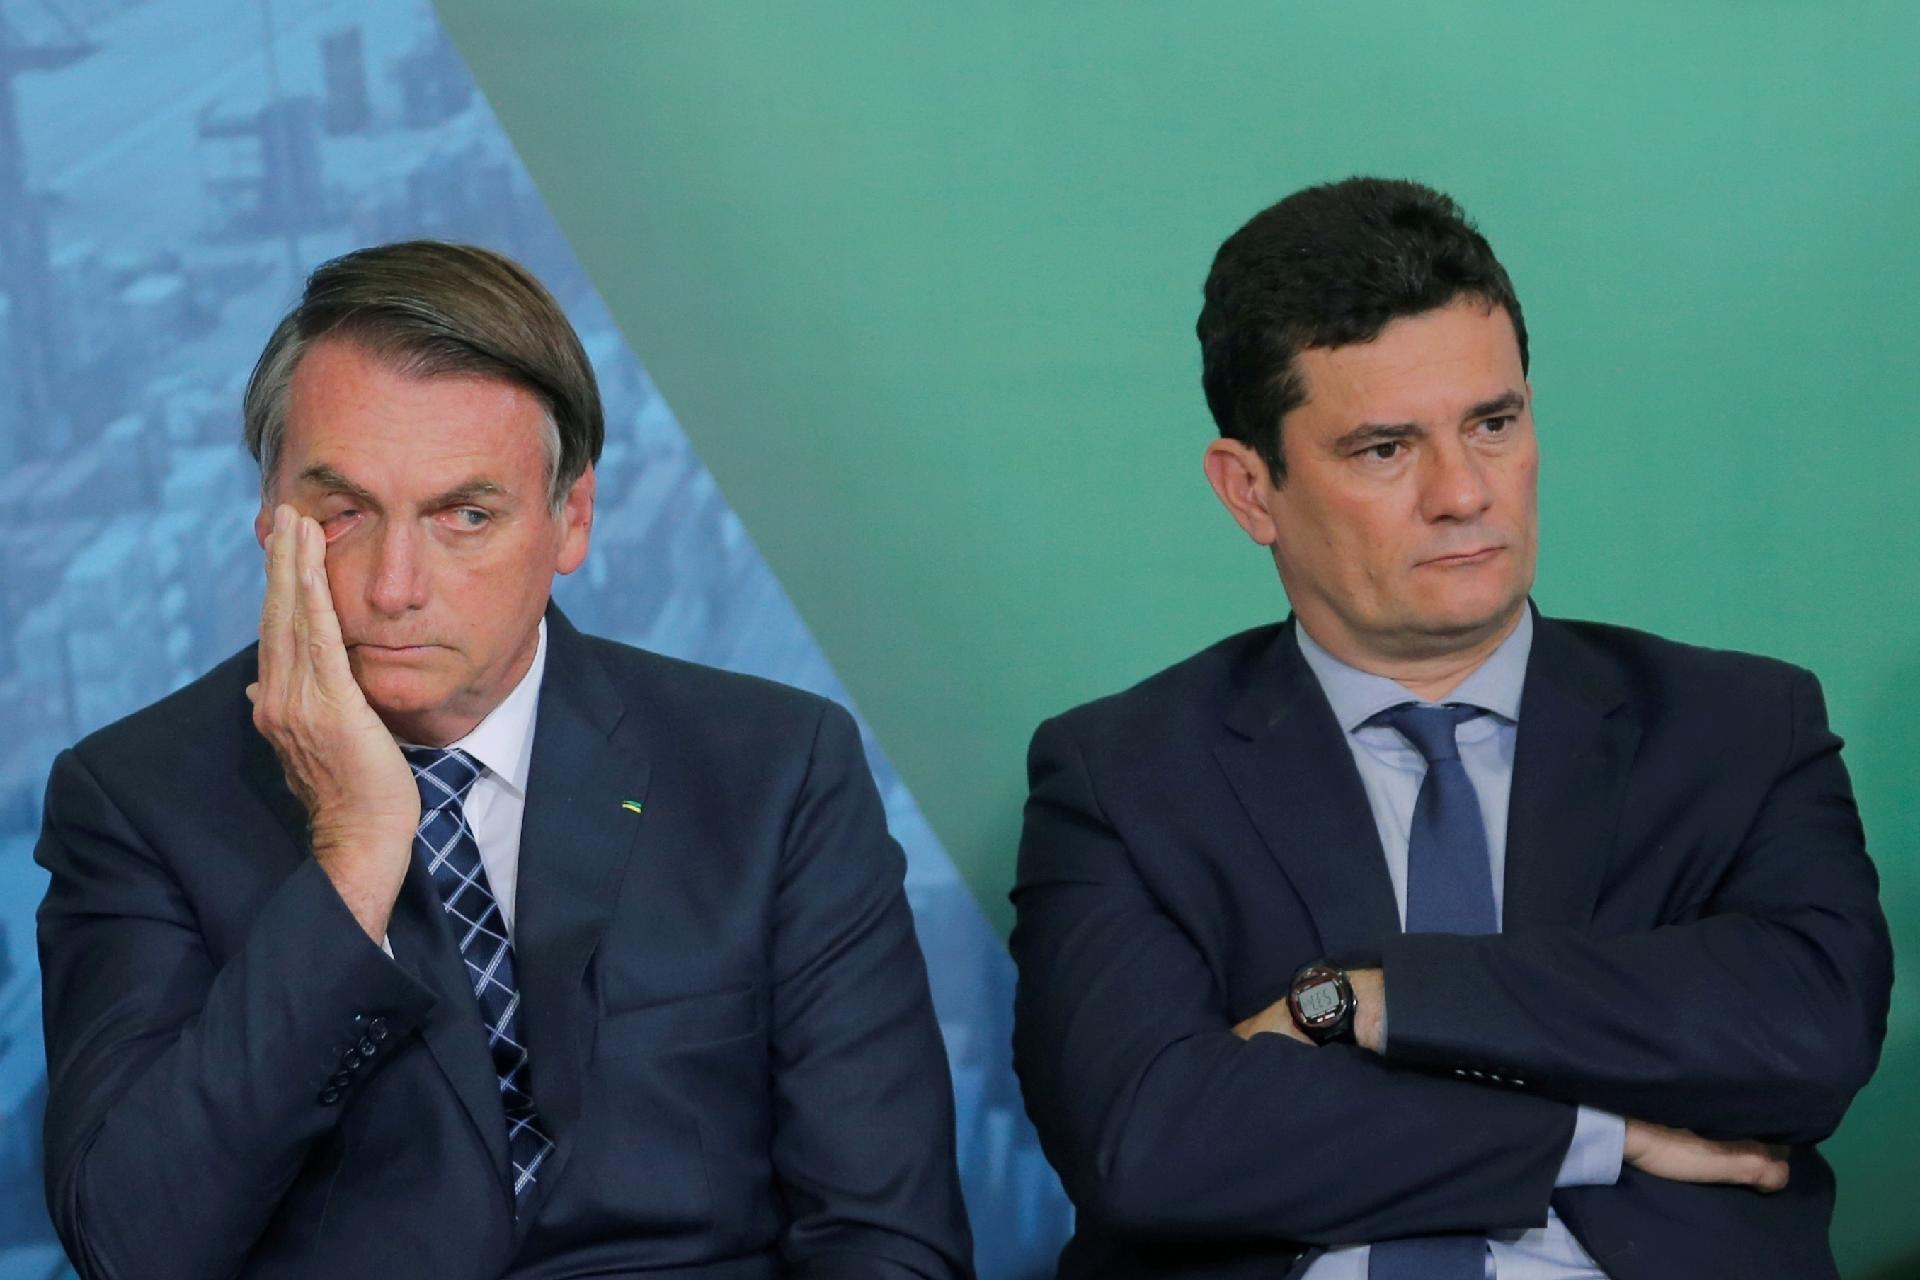 presidente-jair-bolsonaro-e-entao-minist